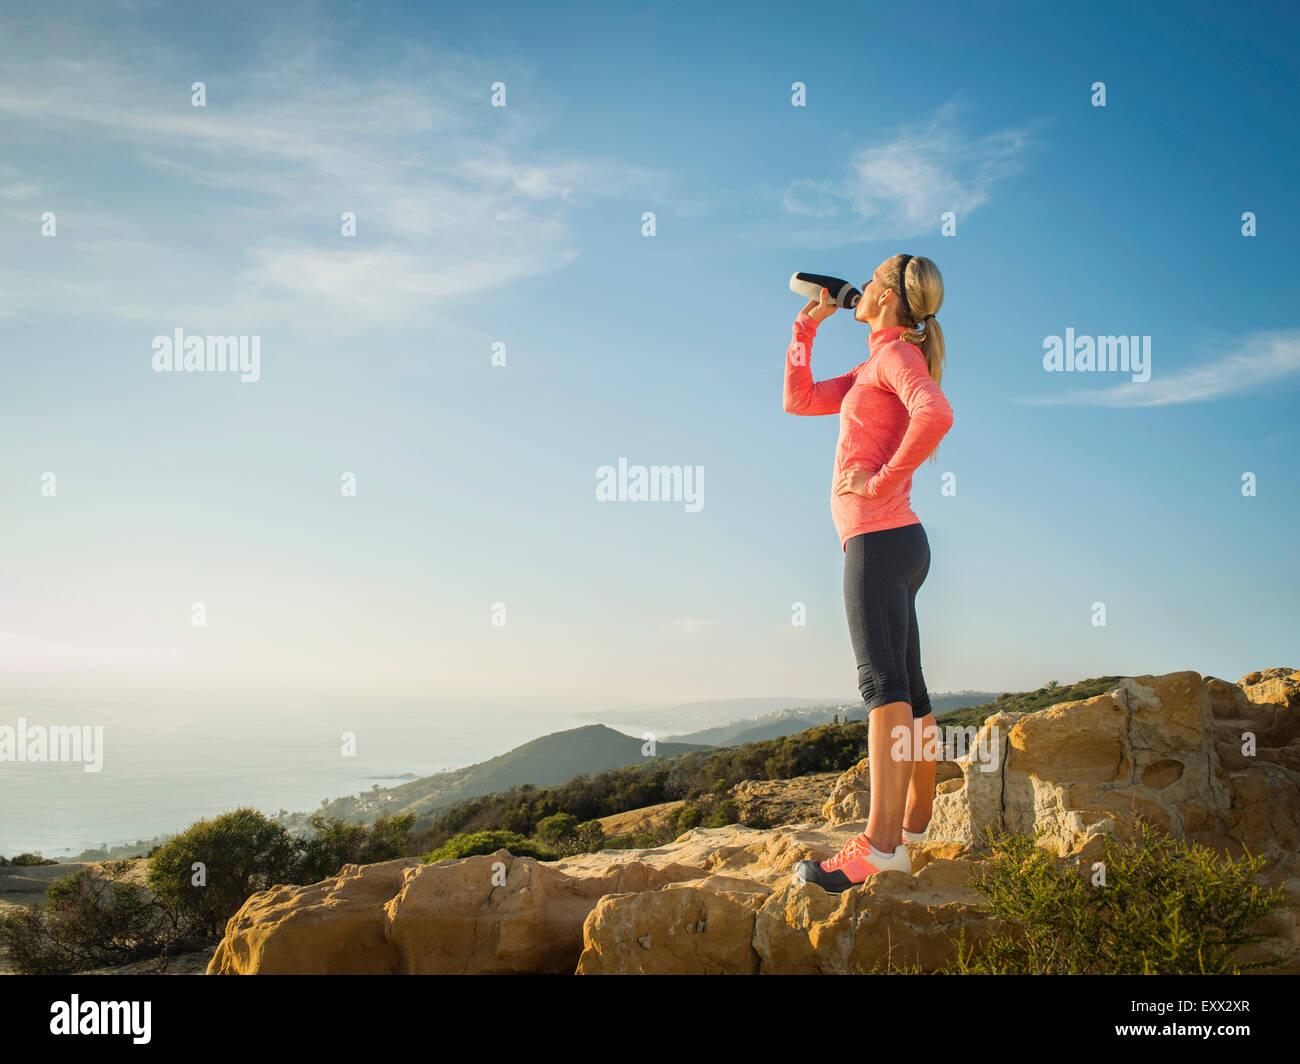 Mujer en ropa deportiva de agua potable Imagen De Stock